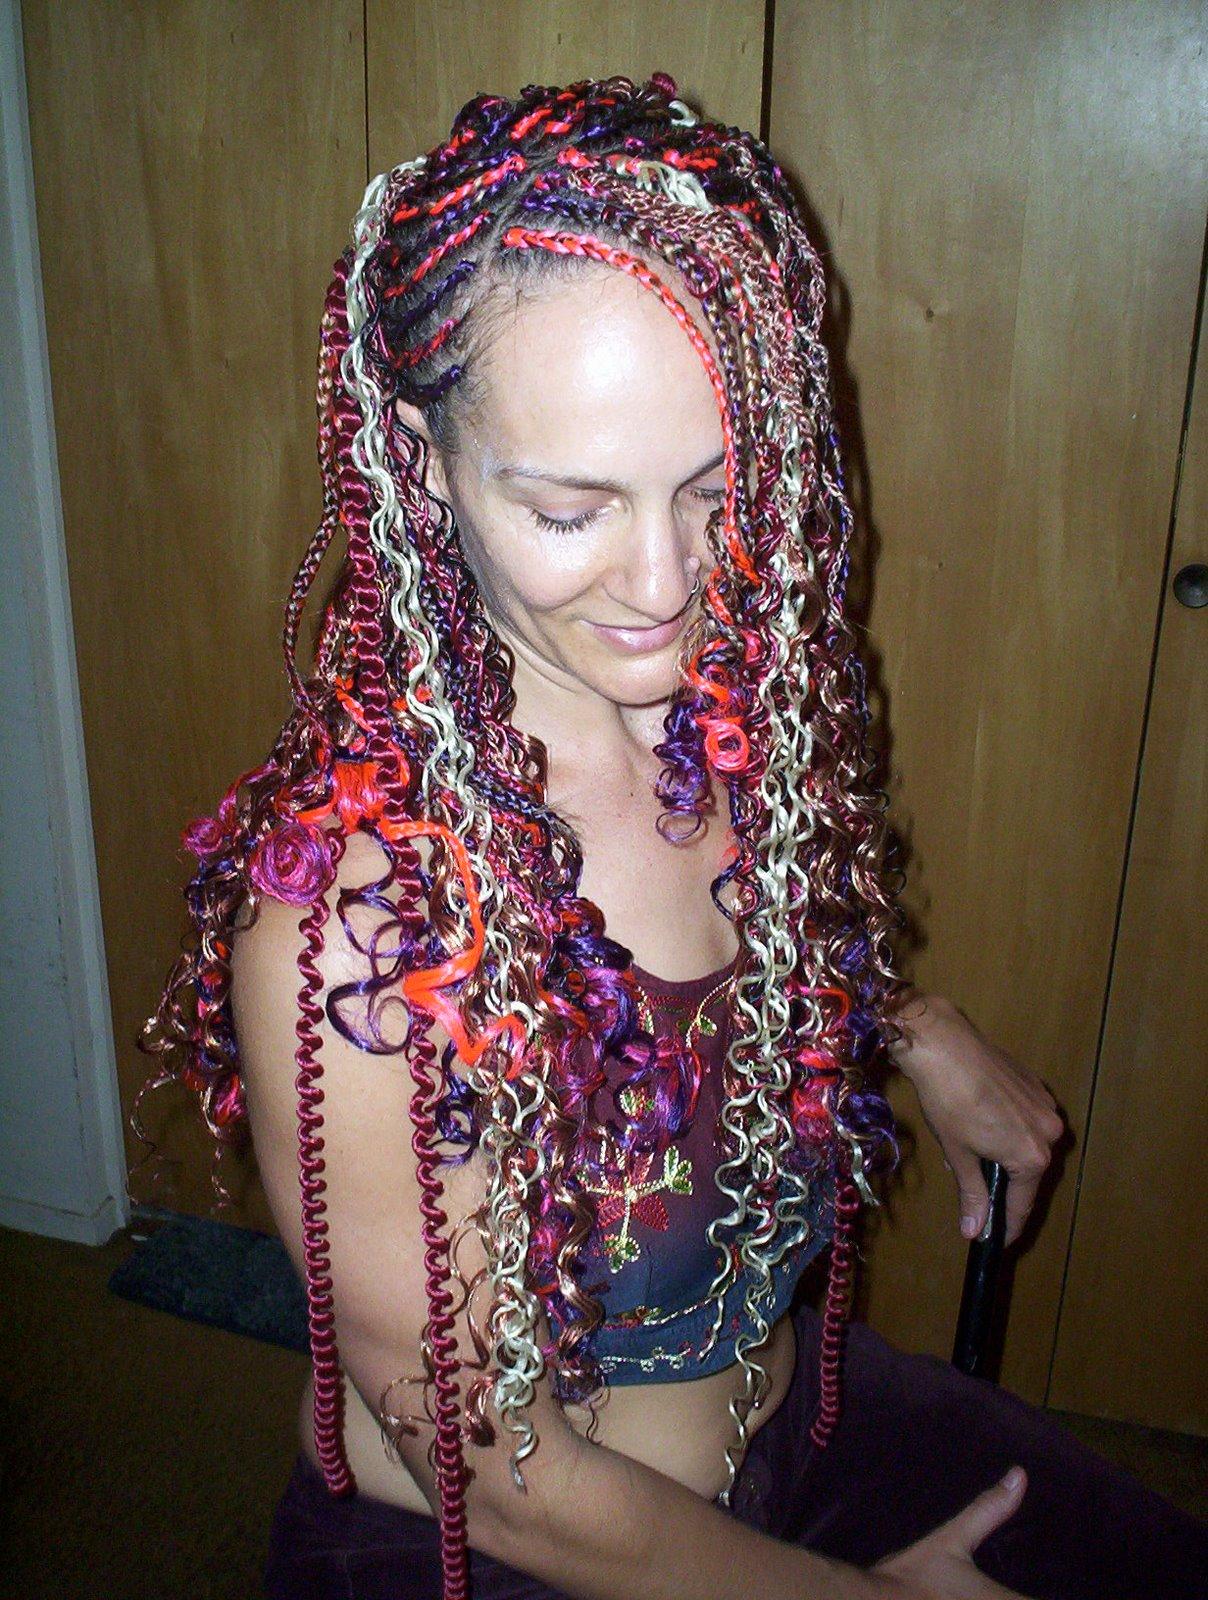 http://1.bp.blogspot.com/_iOekF3uoUvw/S9gjAxavZ3I/AAAAAAAAA3s/cgNWzP1Mzxk/s1600/Braid+Pictures+026.jpg